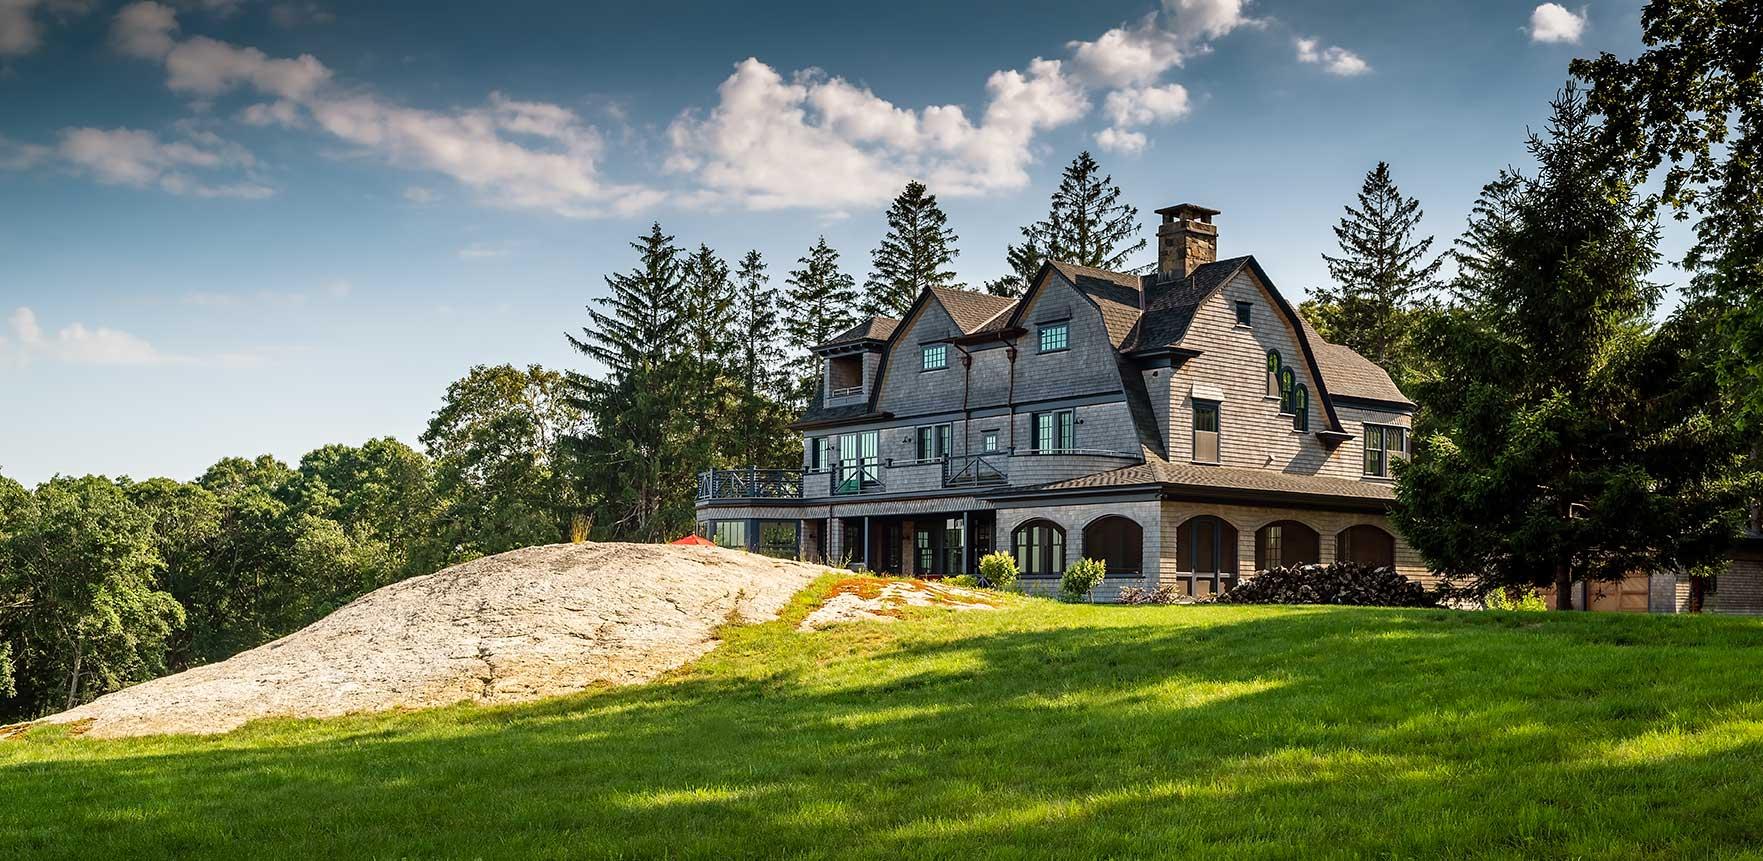 Stephen Sullivan Inc Custom Home Builders - On the Ledge Feature Image